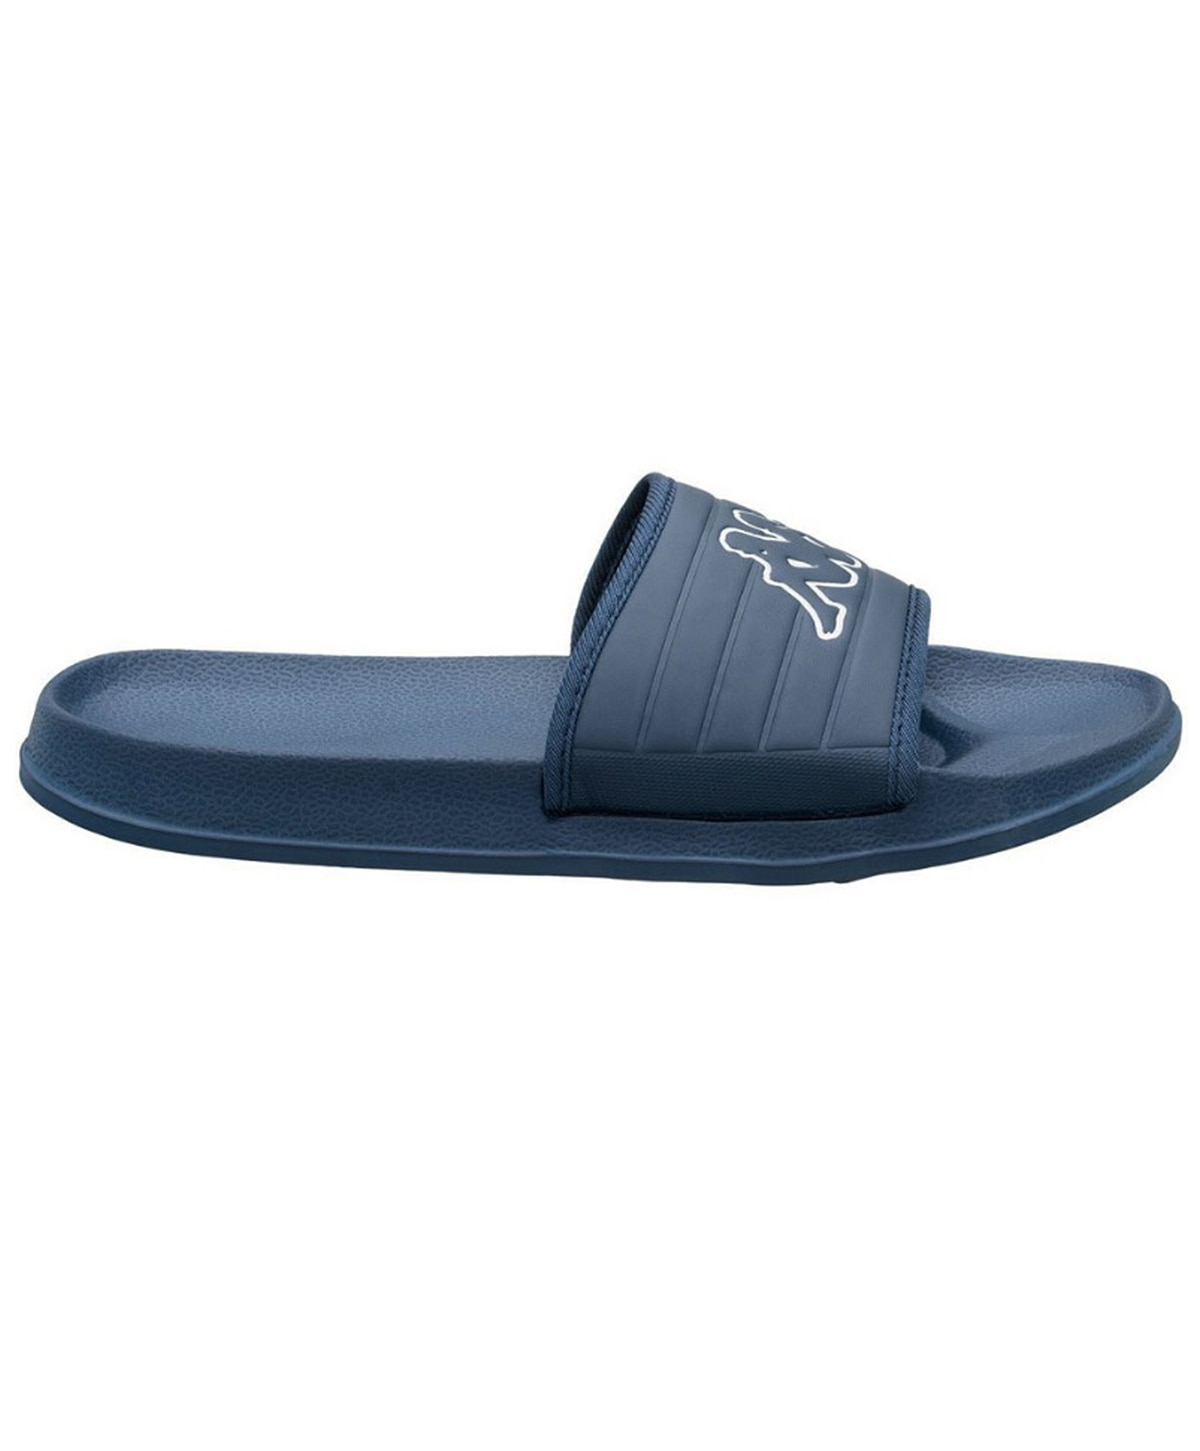 Kappa Lablo slippers